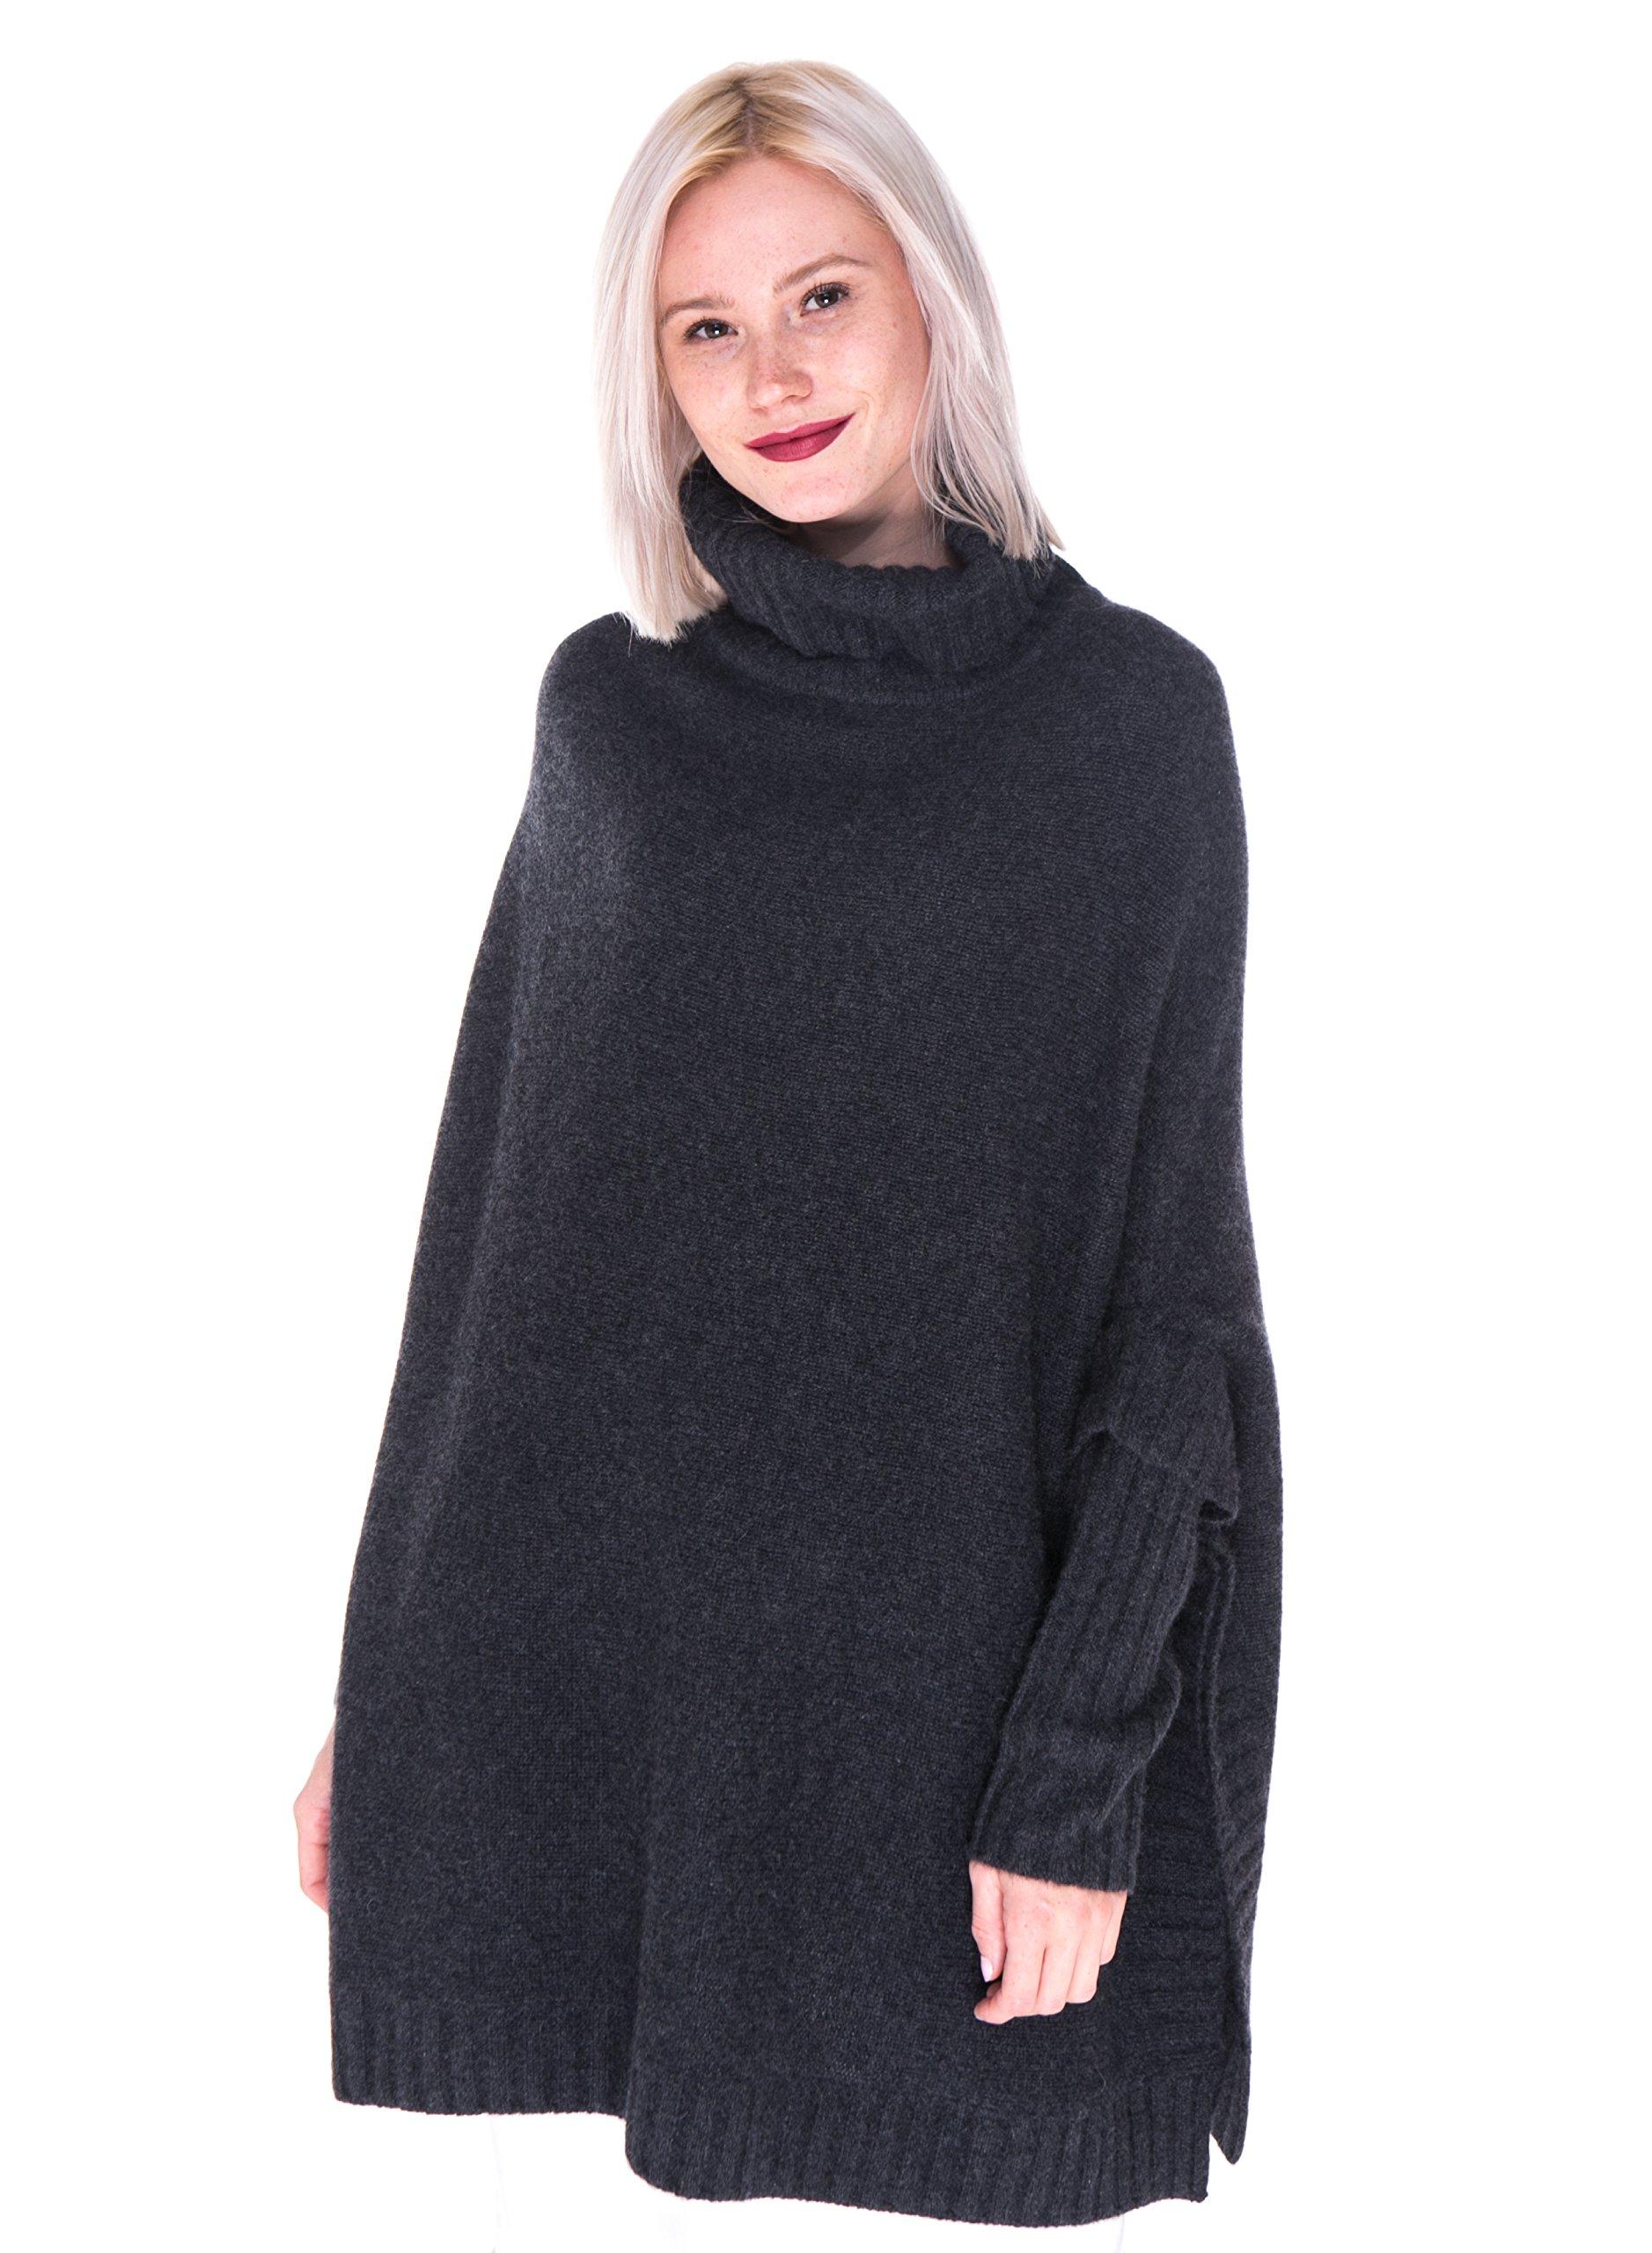 LEBAC Women's 100% Cashmere Turtleneck Oversized Poncho Sweater by LEBAC